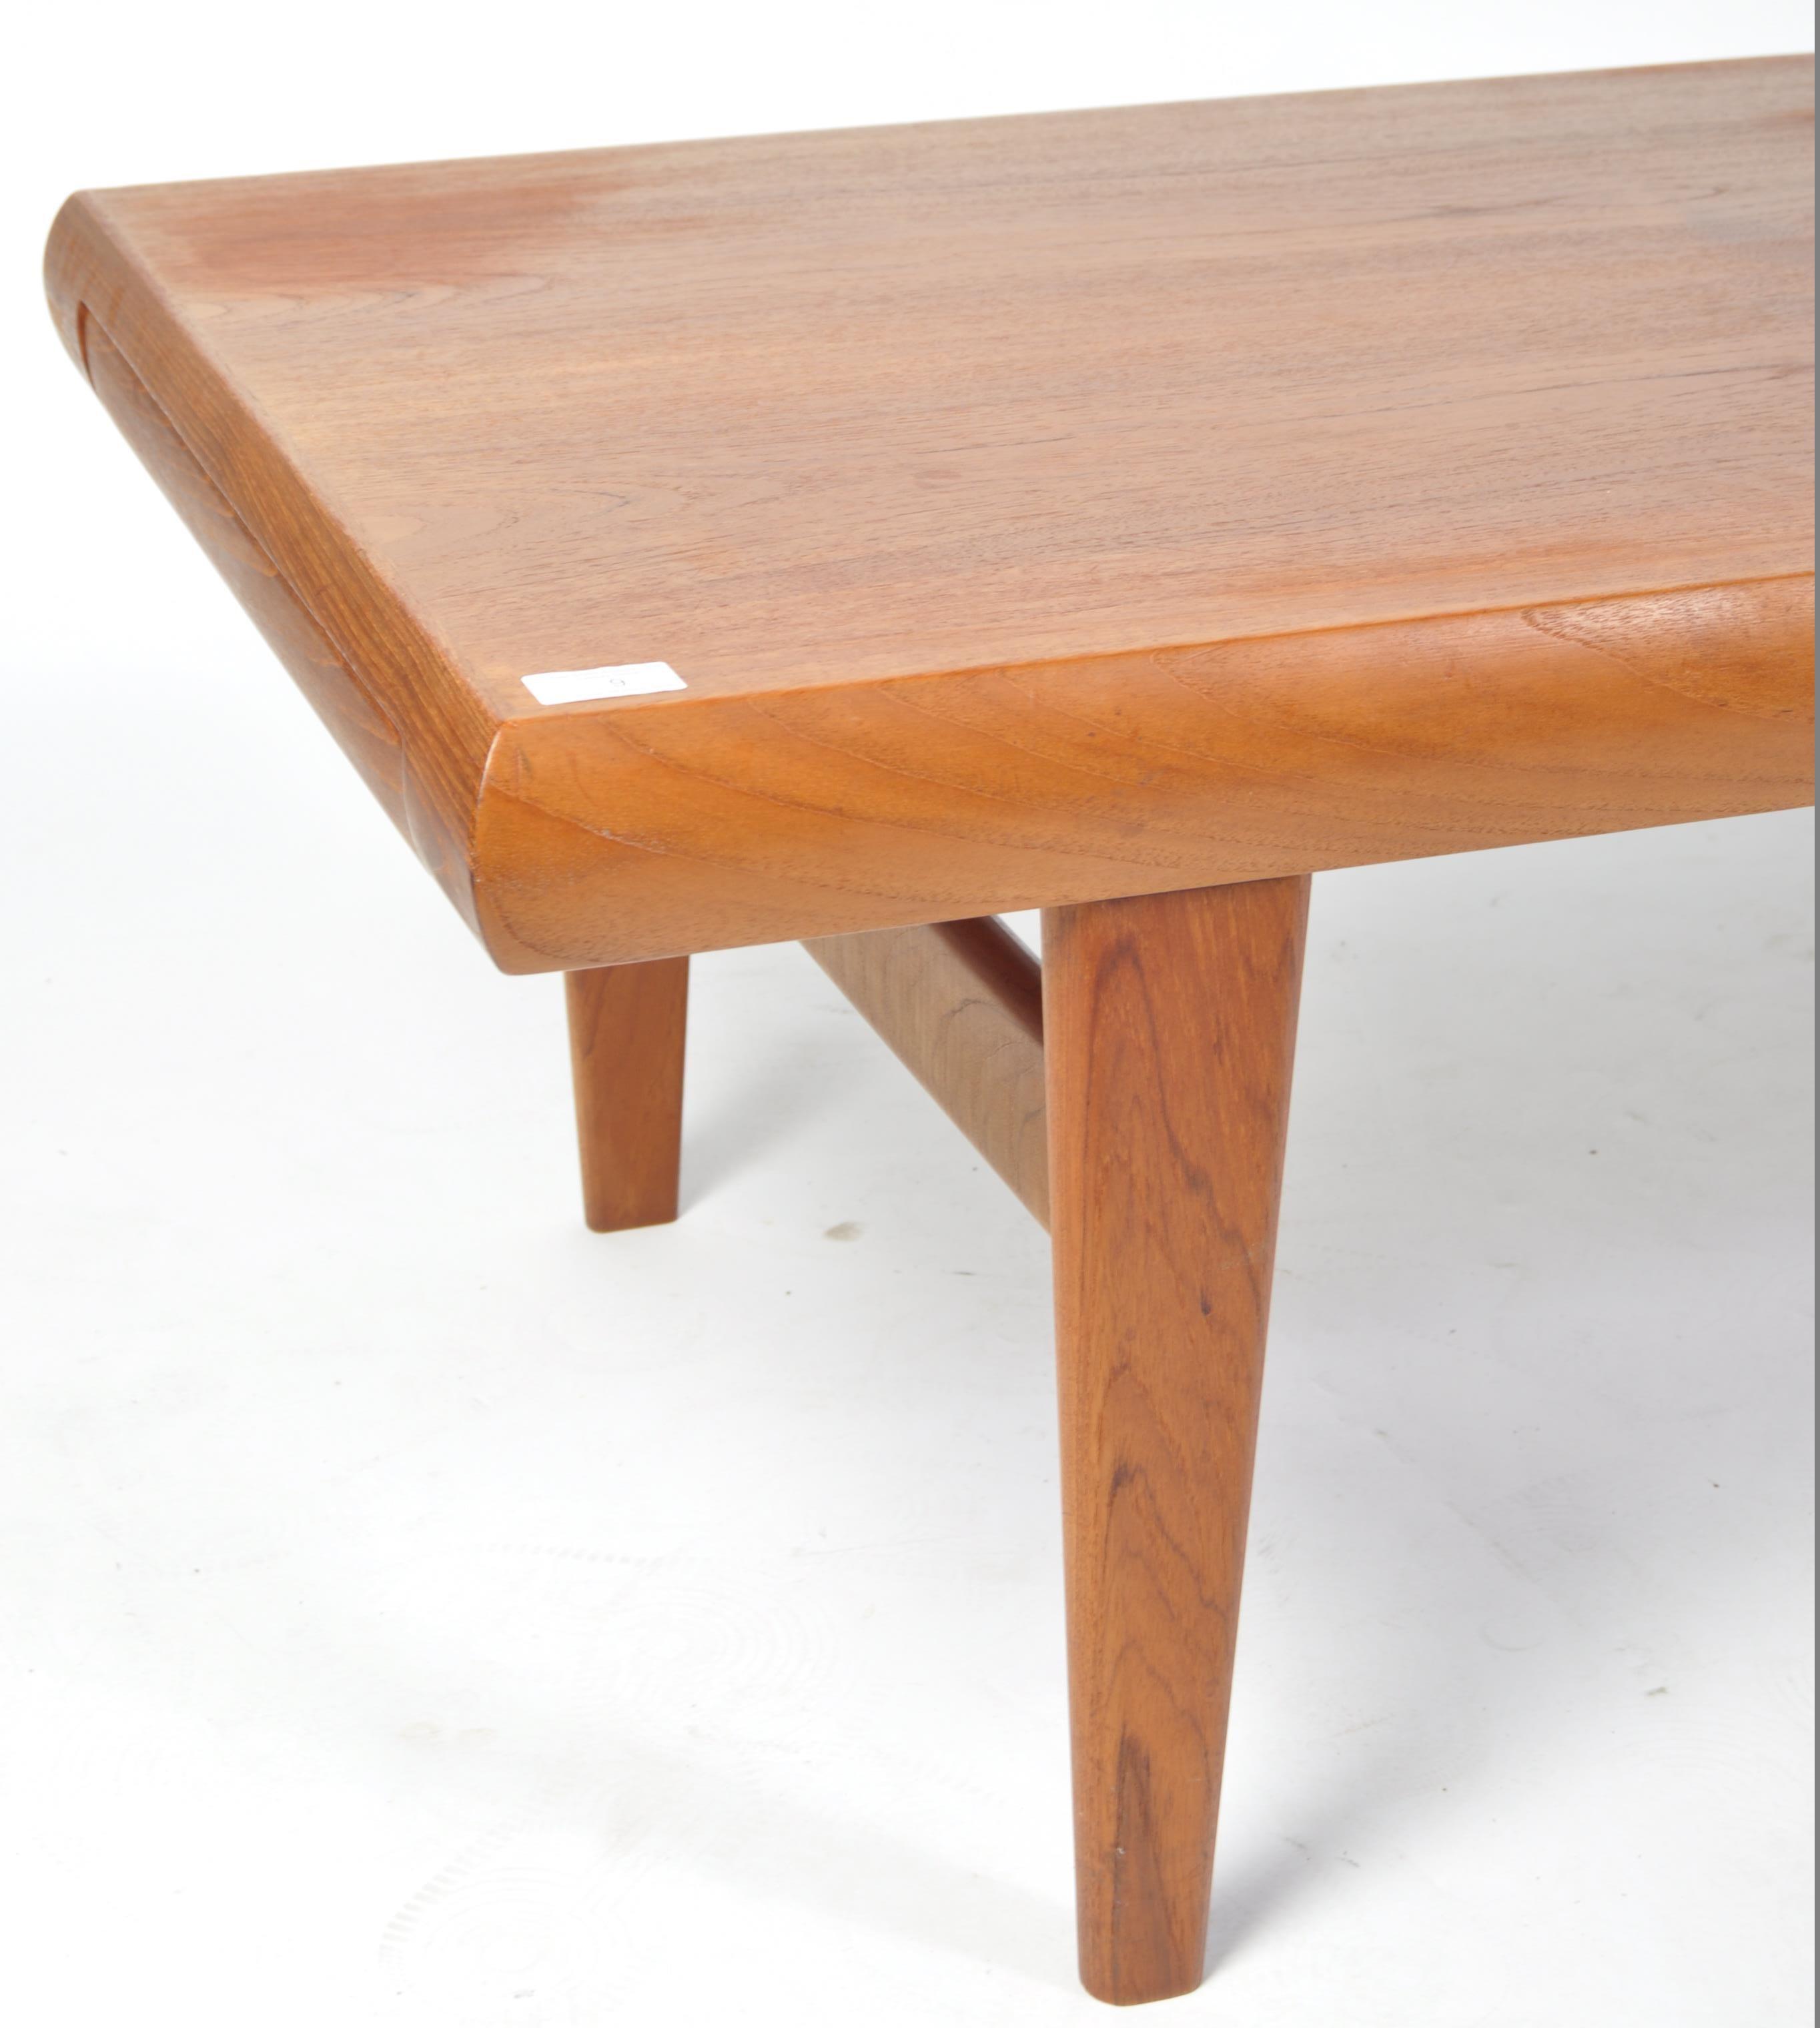 Lot 9 - TRIOH 1970'S RETRO VINTAGE TEAK WOOD COFFEE / CENTRE TABLE